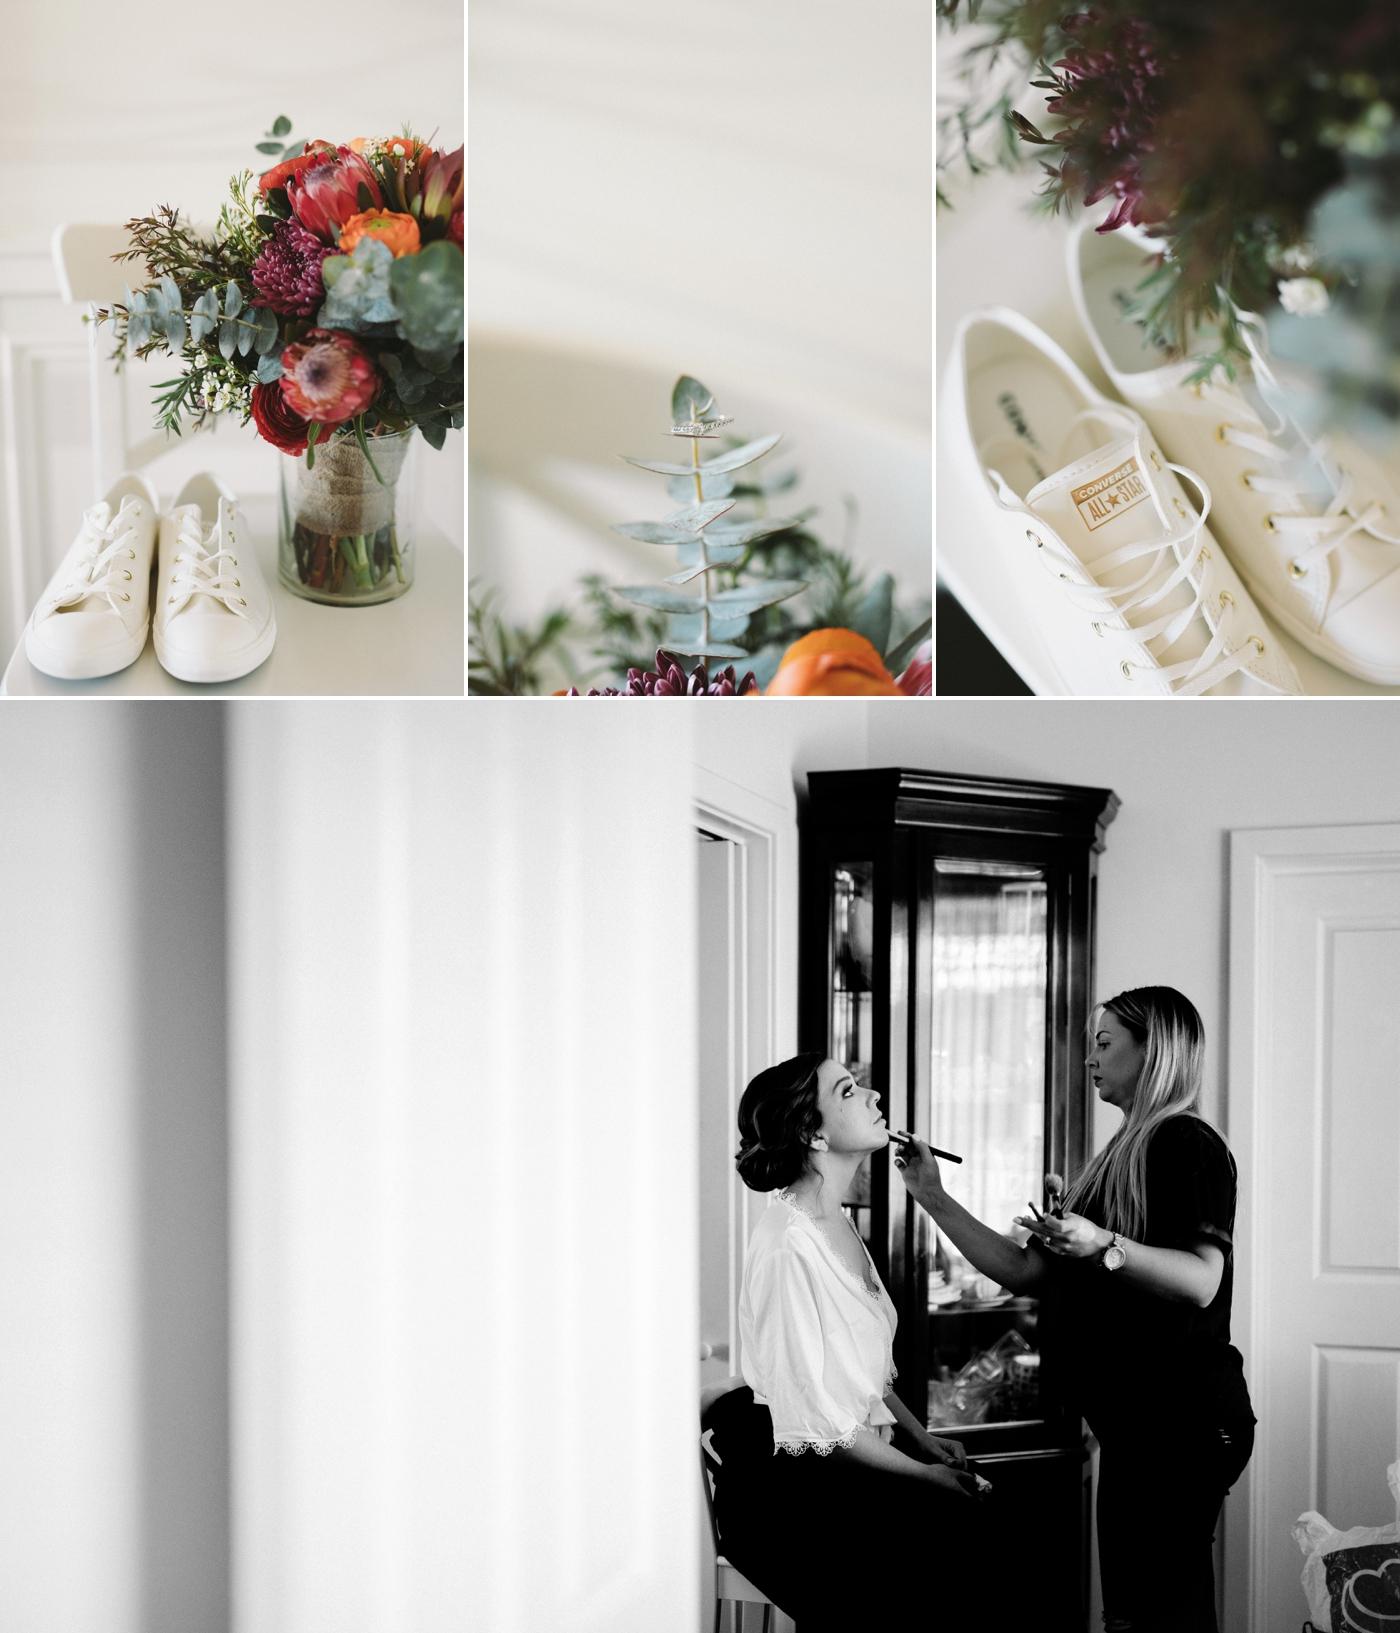 Erin & Ryan - Natural Wedding Photographer in Adelaide - Maximillians Wedding - Simple and Modern Wedding Photographer - Katherine Schultz - www.katherineschultzphotography.com_0002.jpg